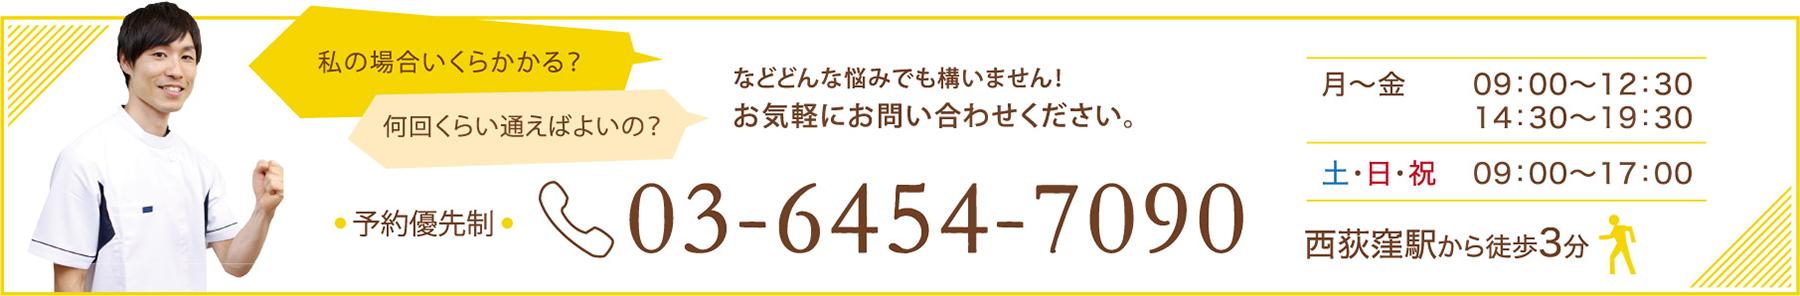 03-6454-7090